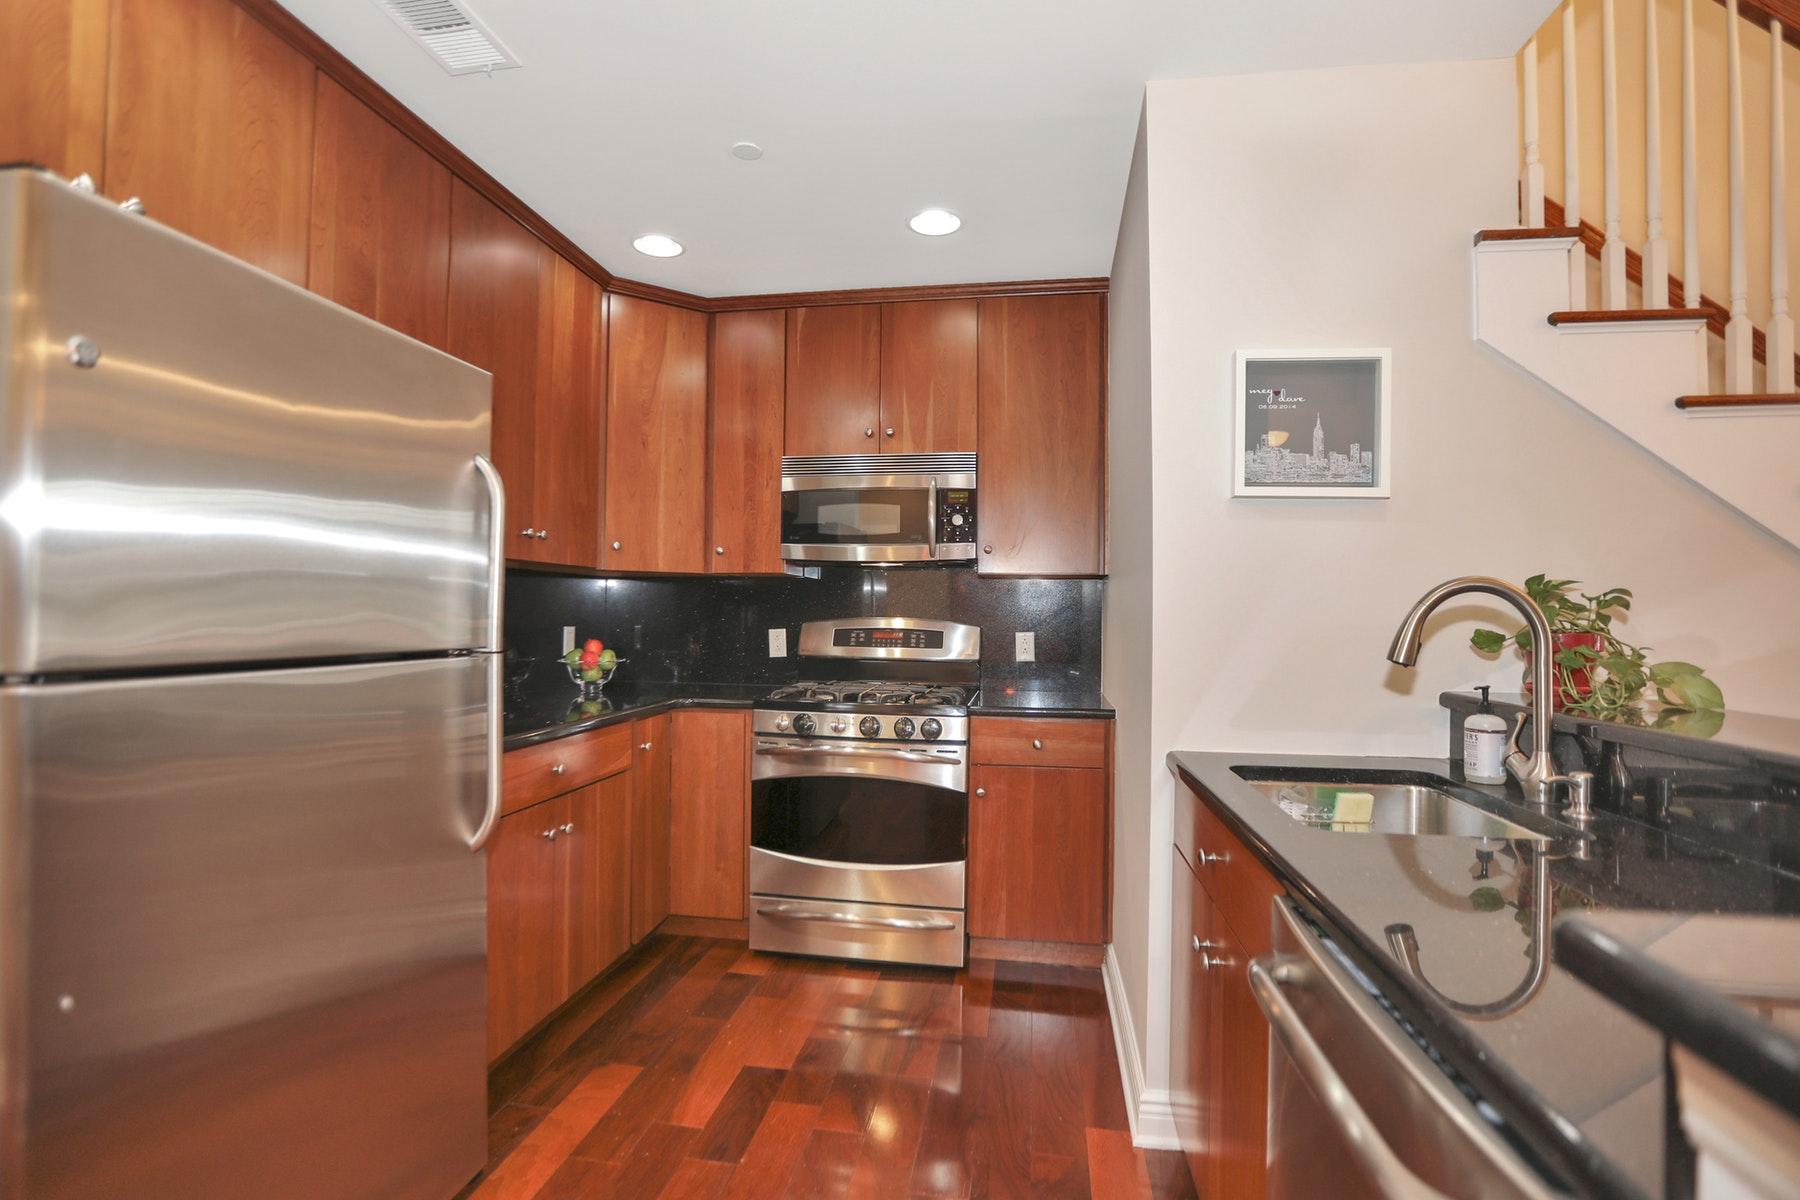 Condominiums για την Πώληση στο 7400 River Road # 447 Hudson Pointe, North Bergen, Νιου Τζερσεϋ 07047 Ηνωμένες Πολιτείες